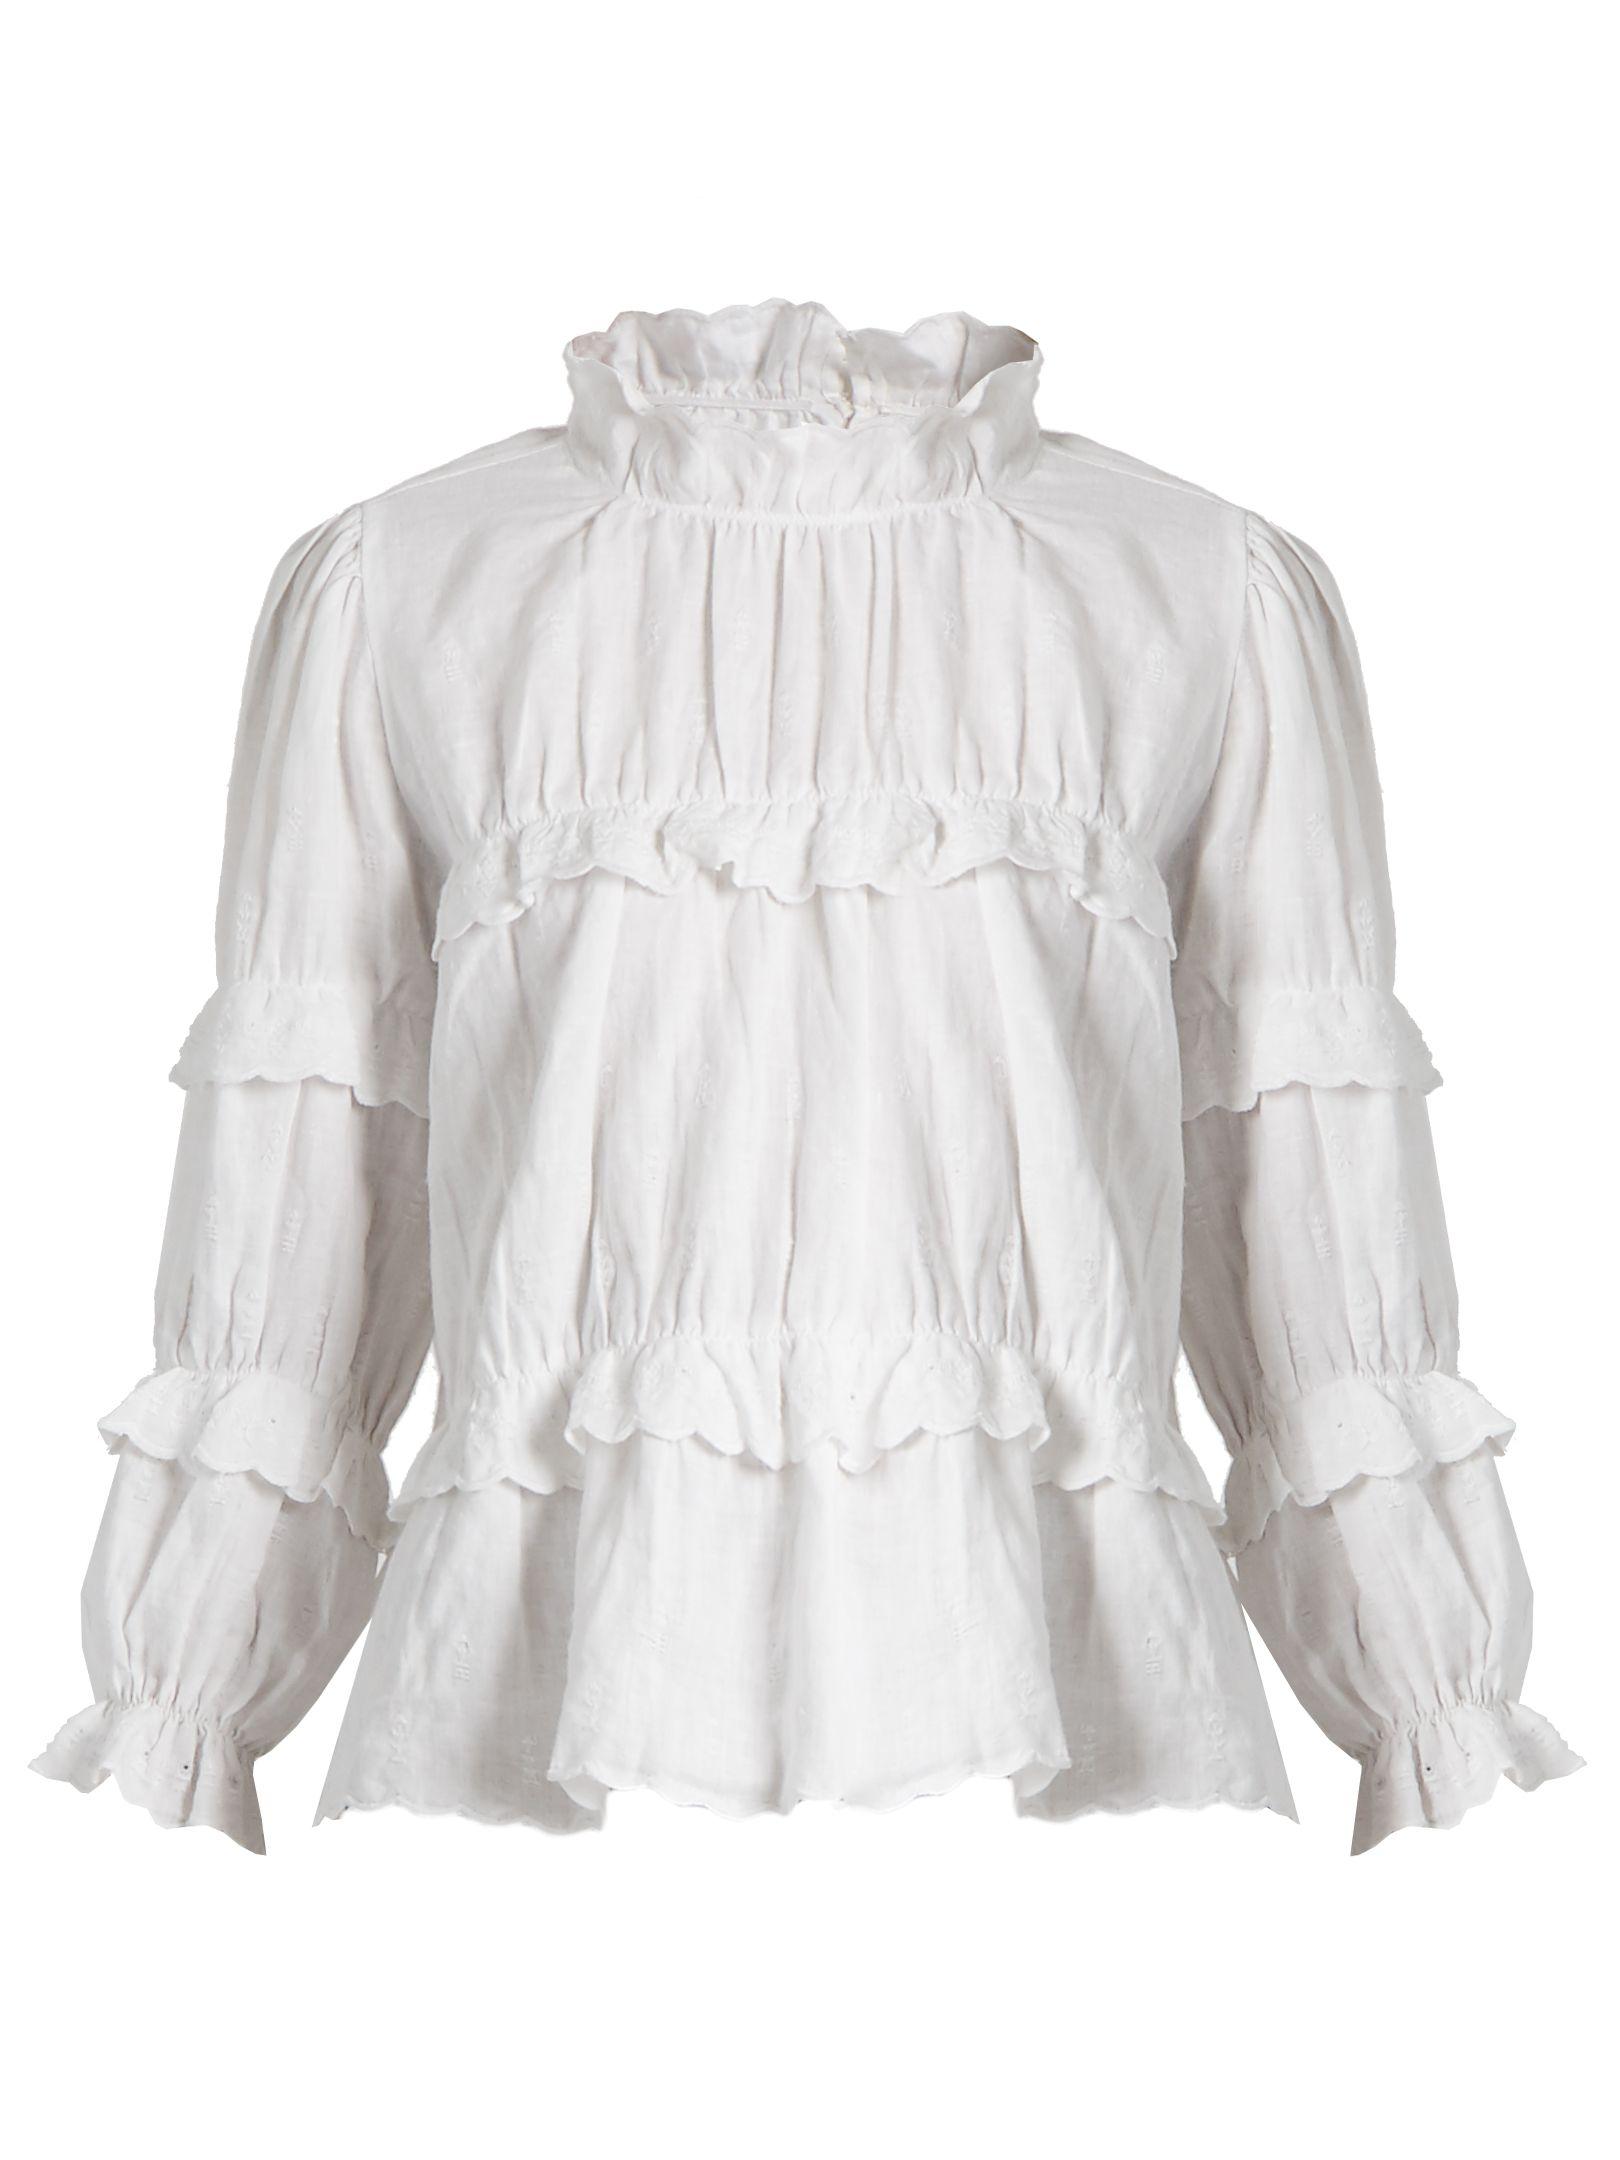 90a8cb5d3b Daniela ruffled high-neck blouse | Isabel Marant Étoile |  MATCHESFASHION.COM UK